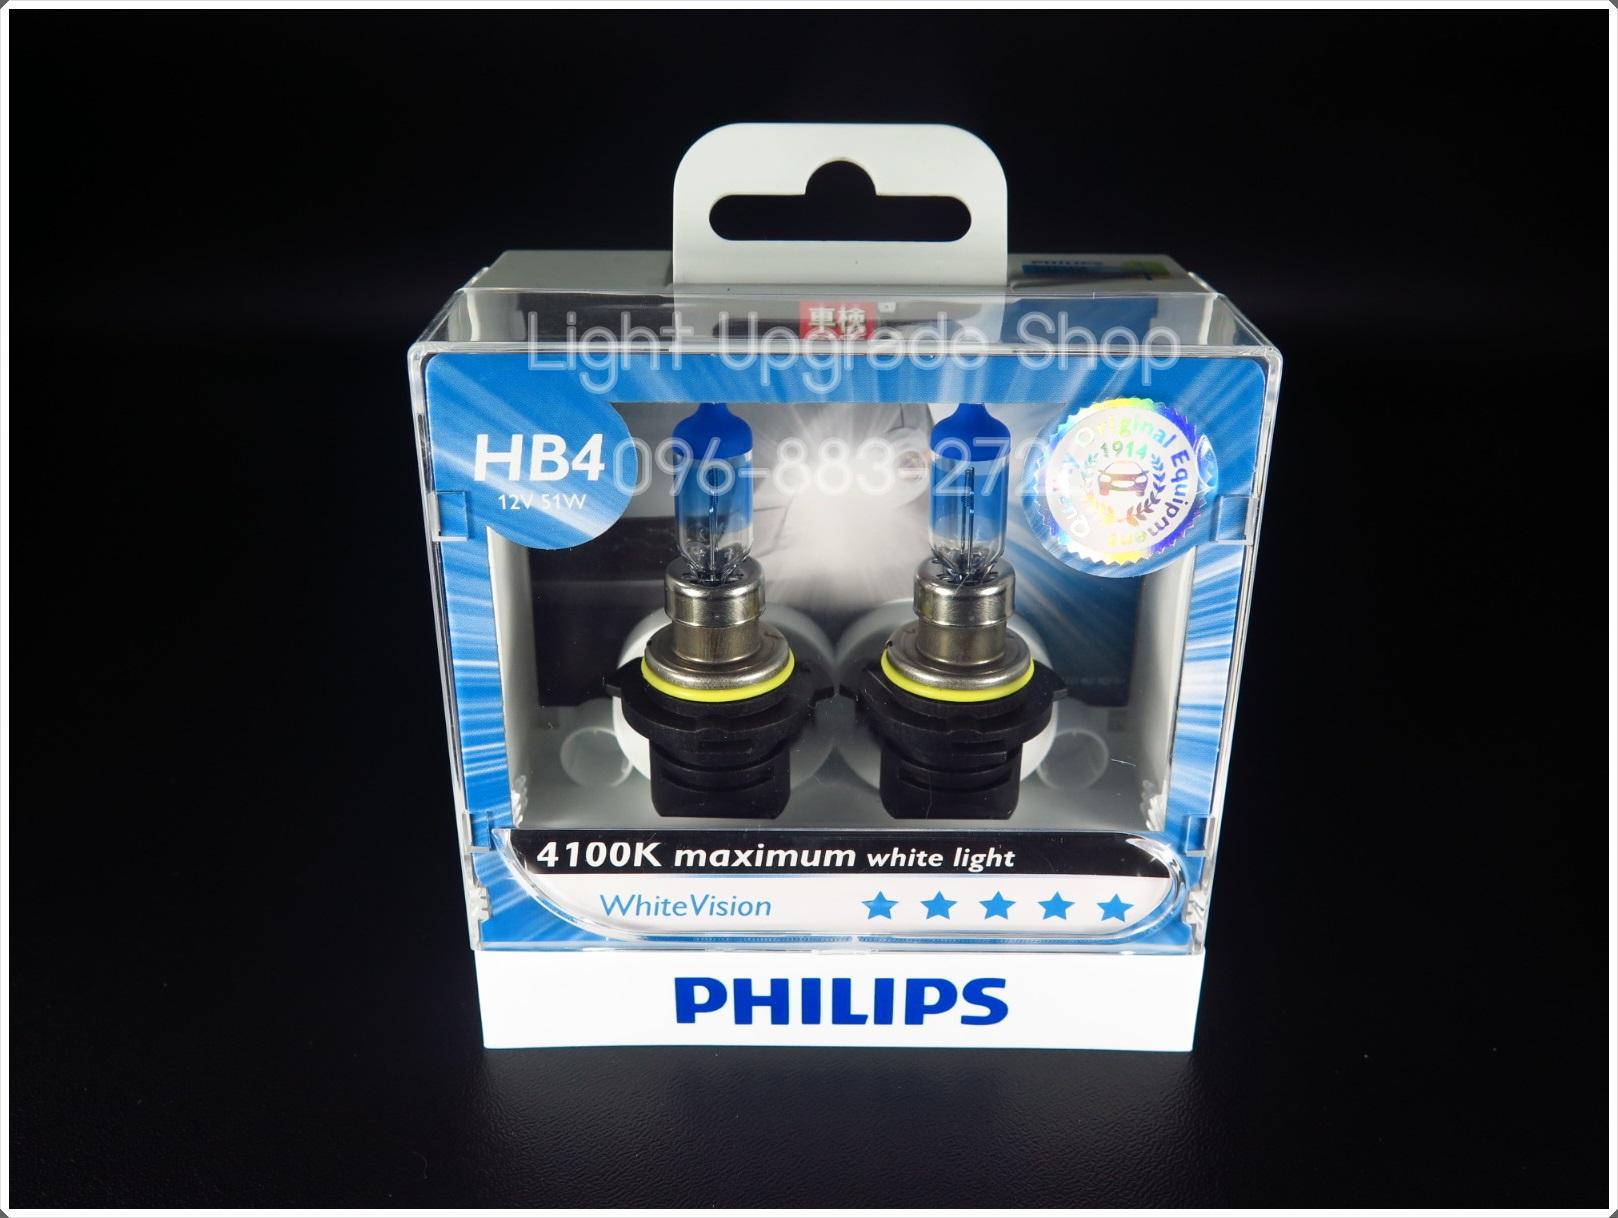 Philips White Vision 4100K [HB4]